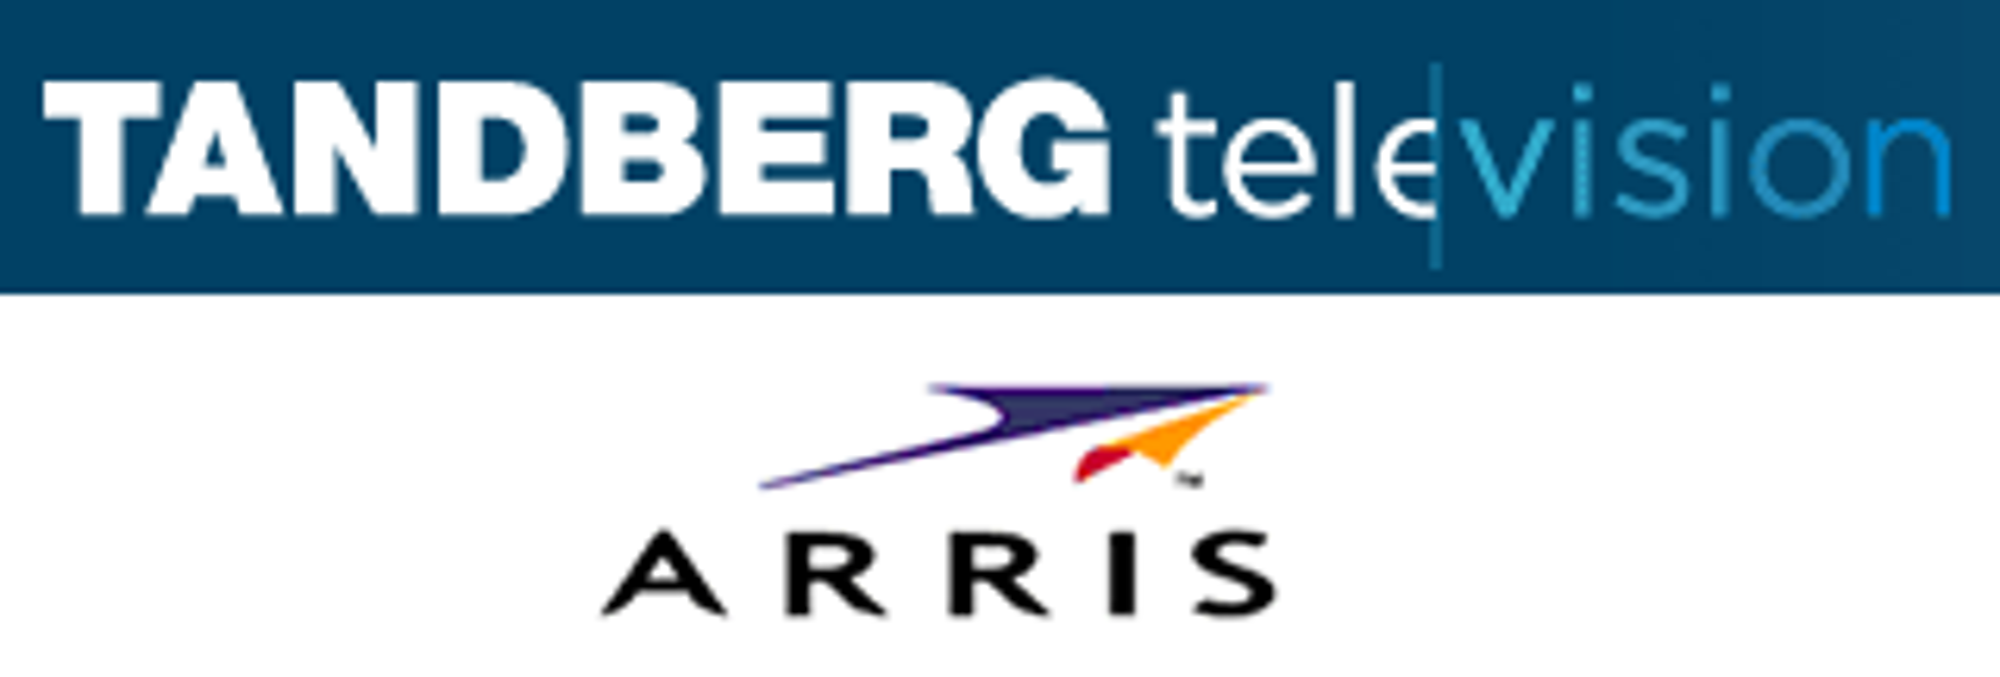 Tandberg Televisjon, Arris